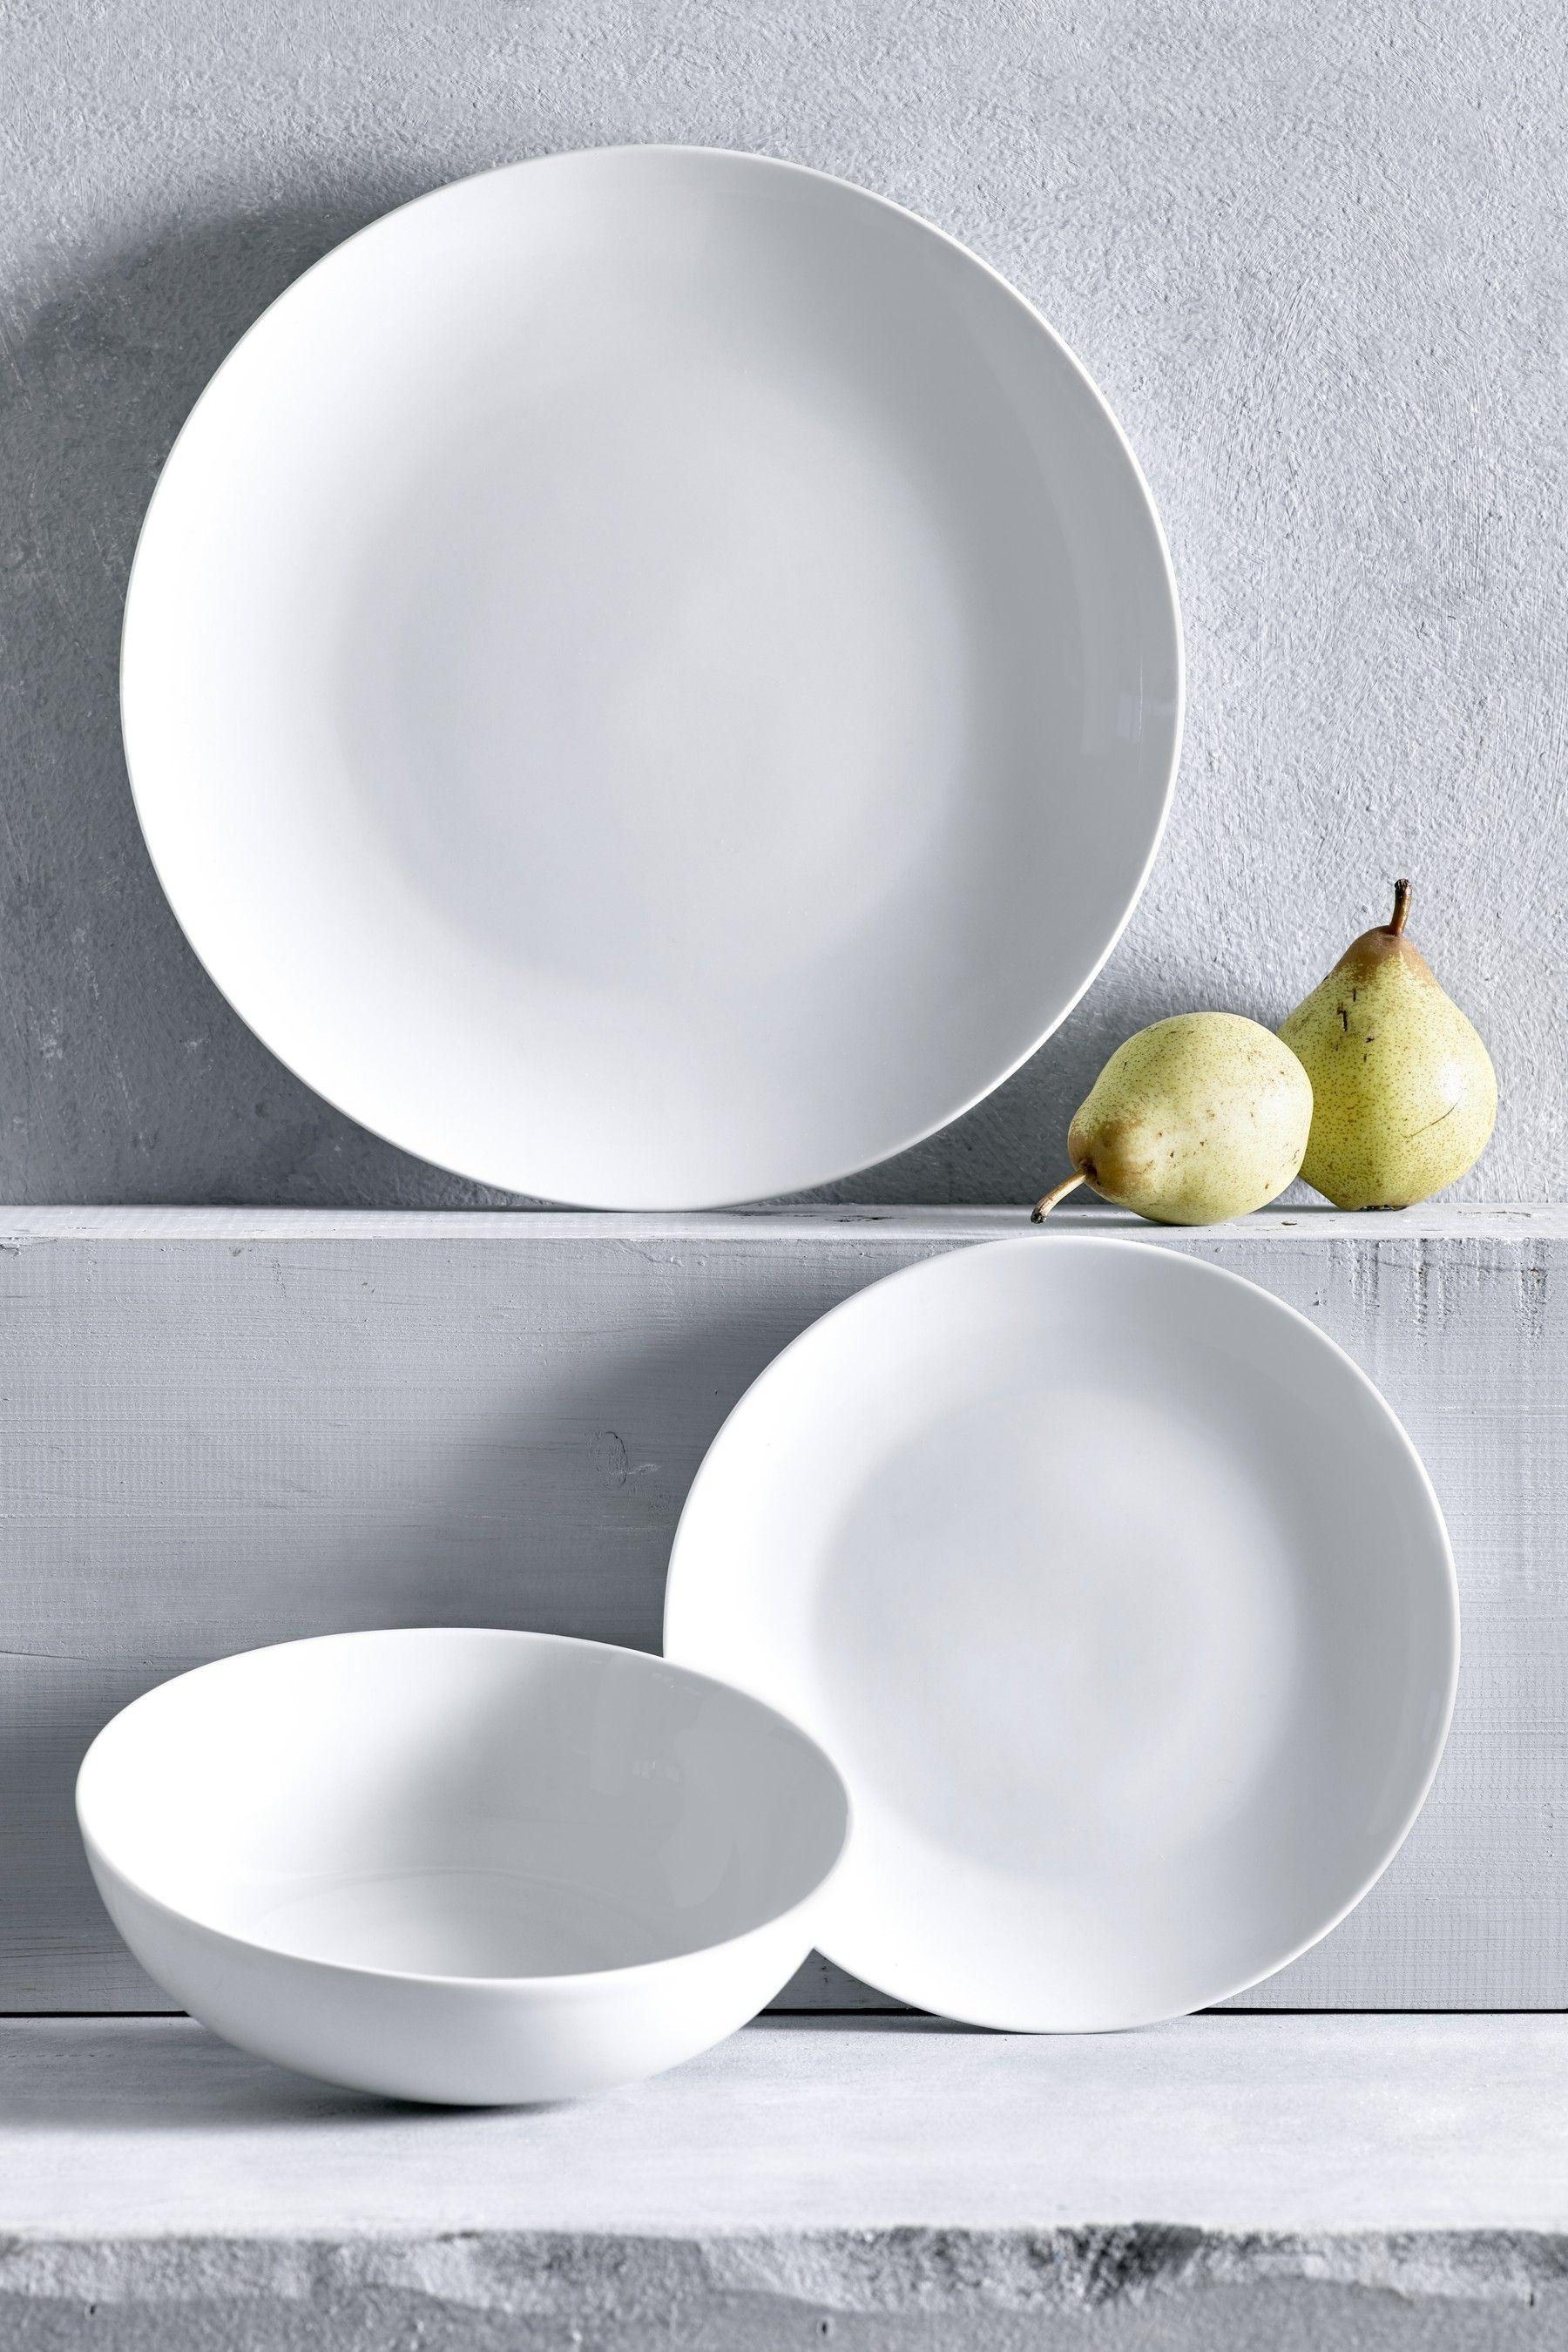 Studio Set Of 4 Pasta Bowls In 2020 Dinner Sets Buy Kitchen Plates